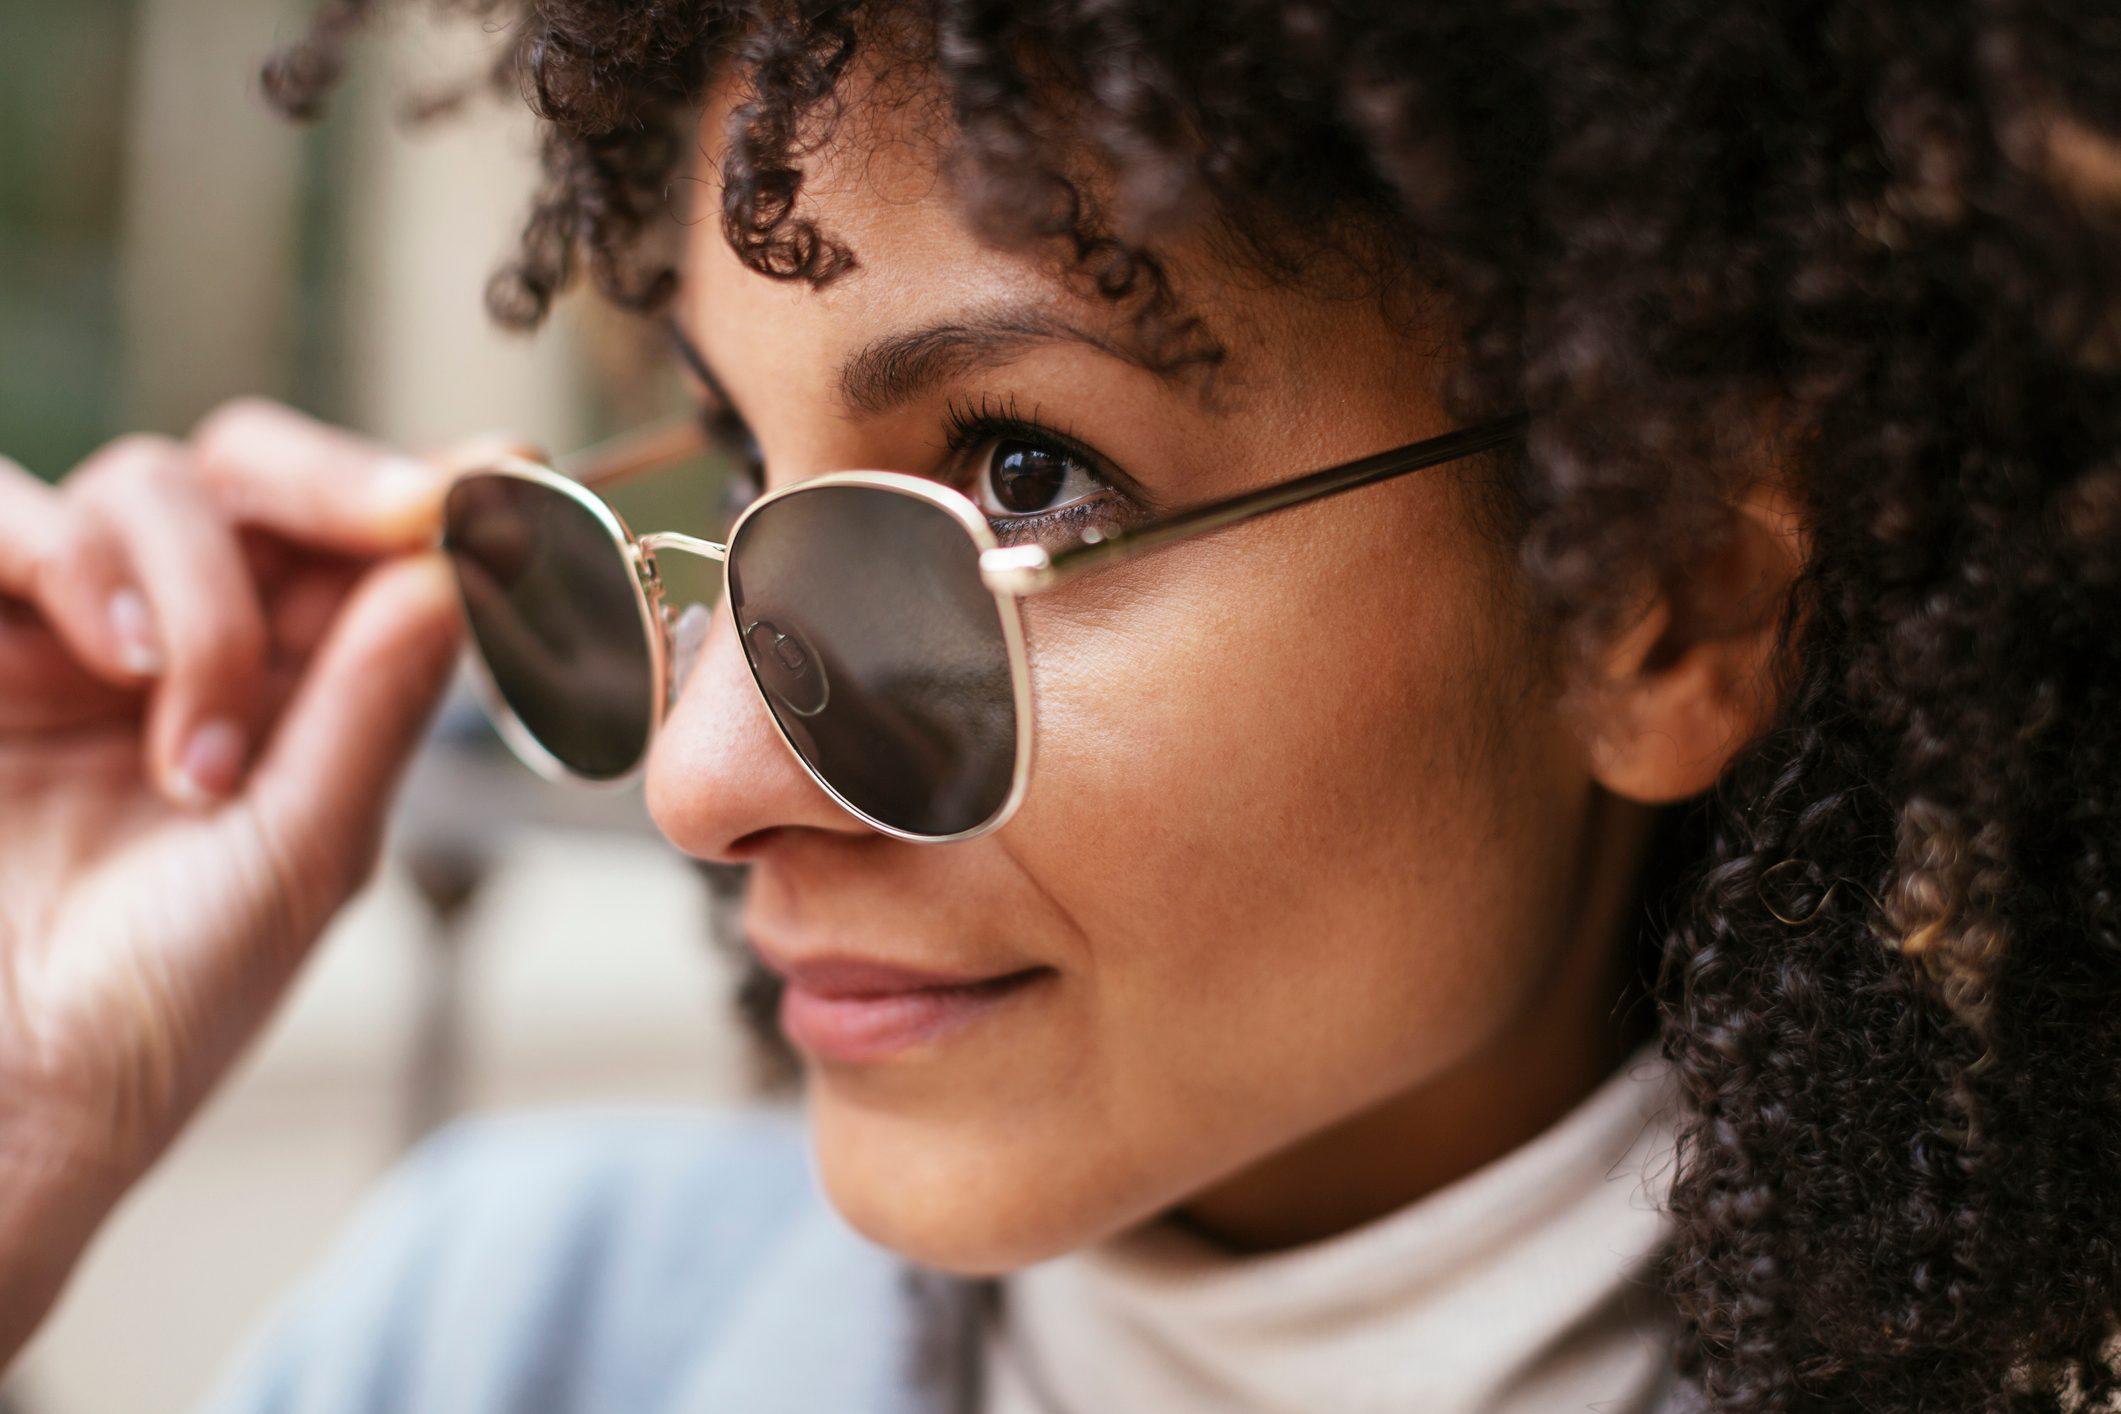 close up of woman wearing sunglasses